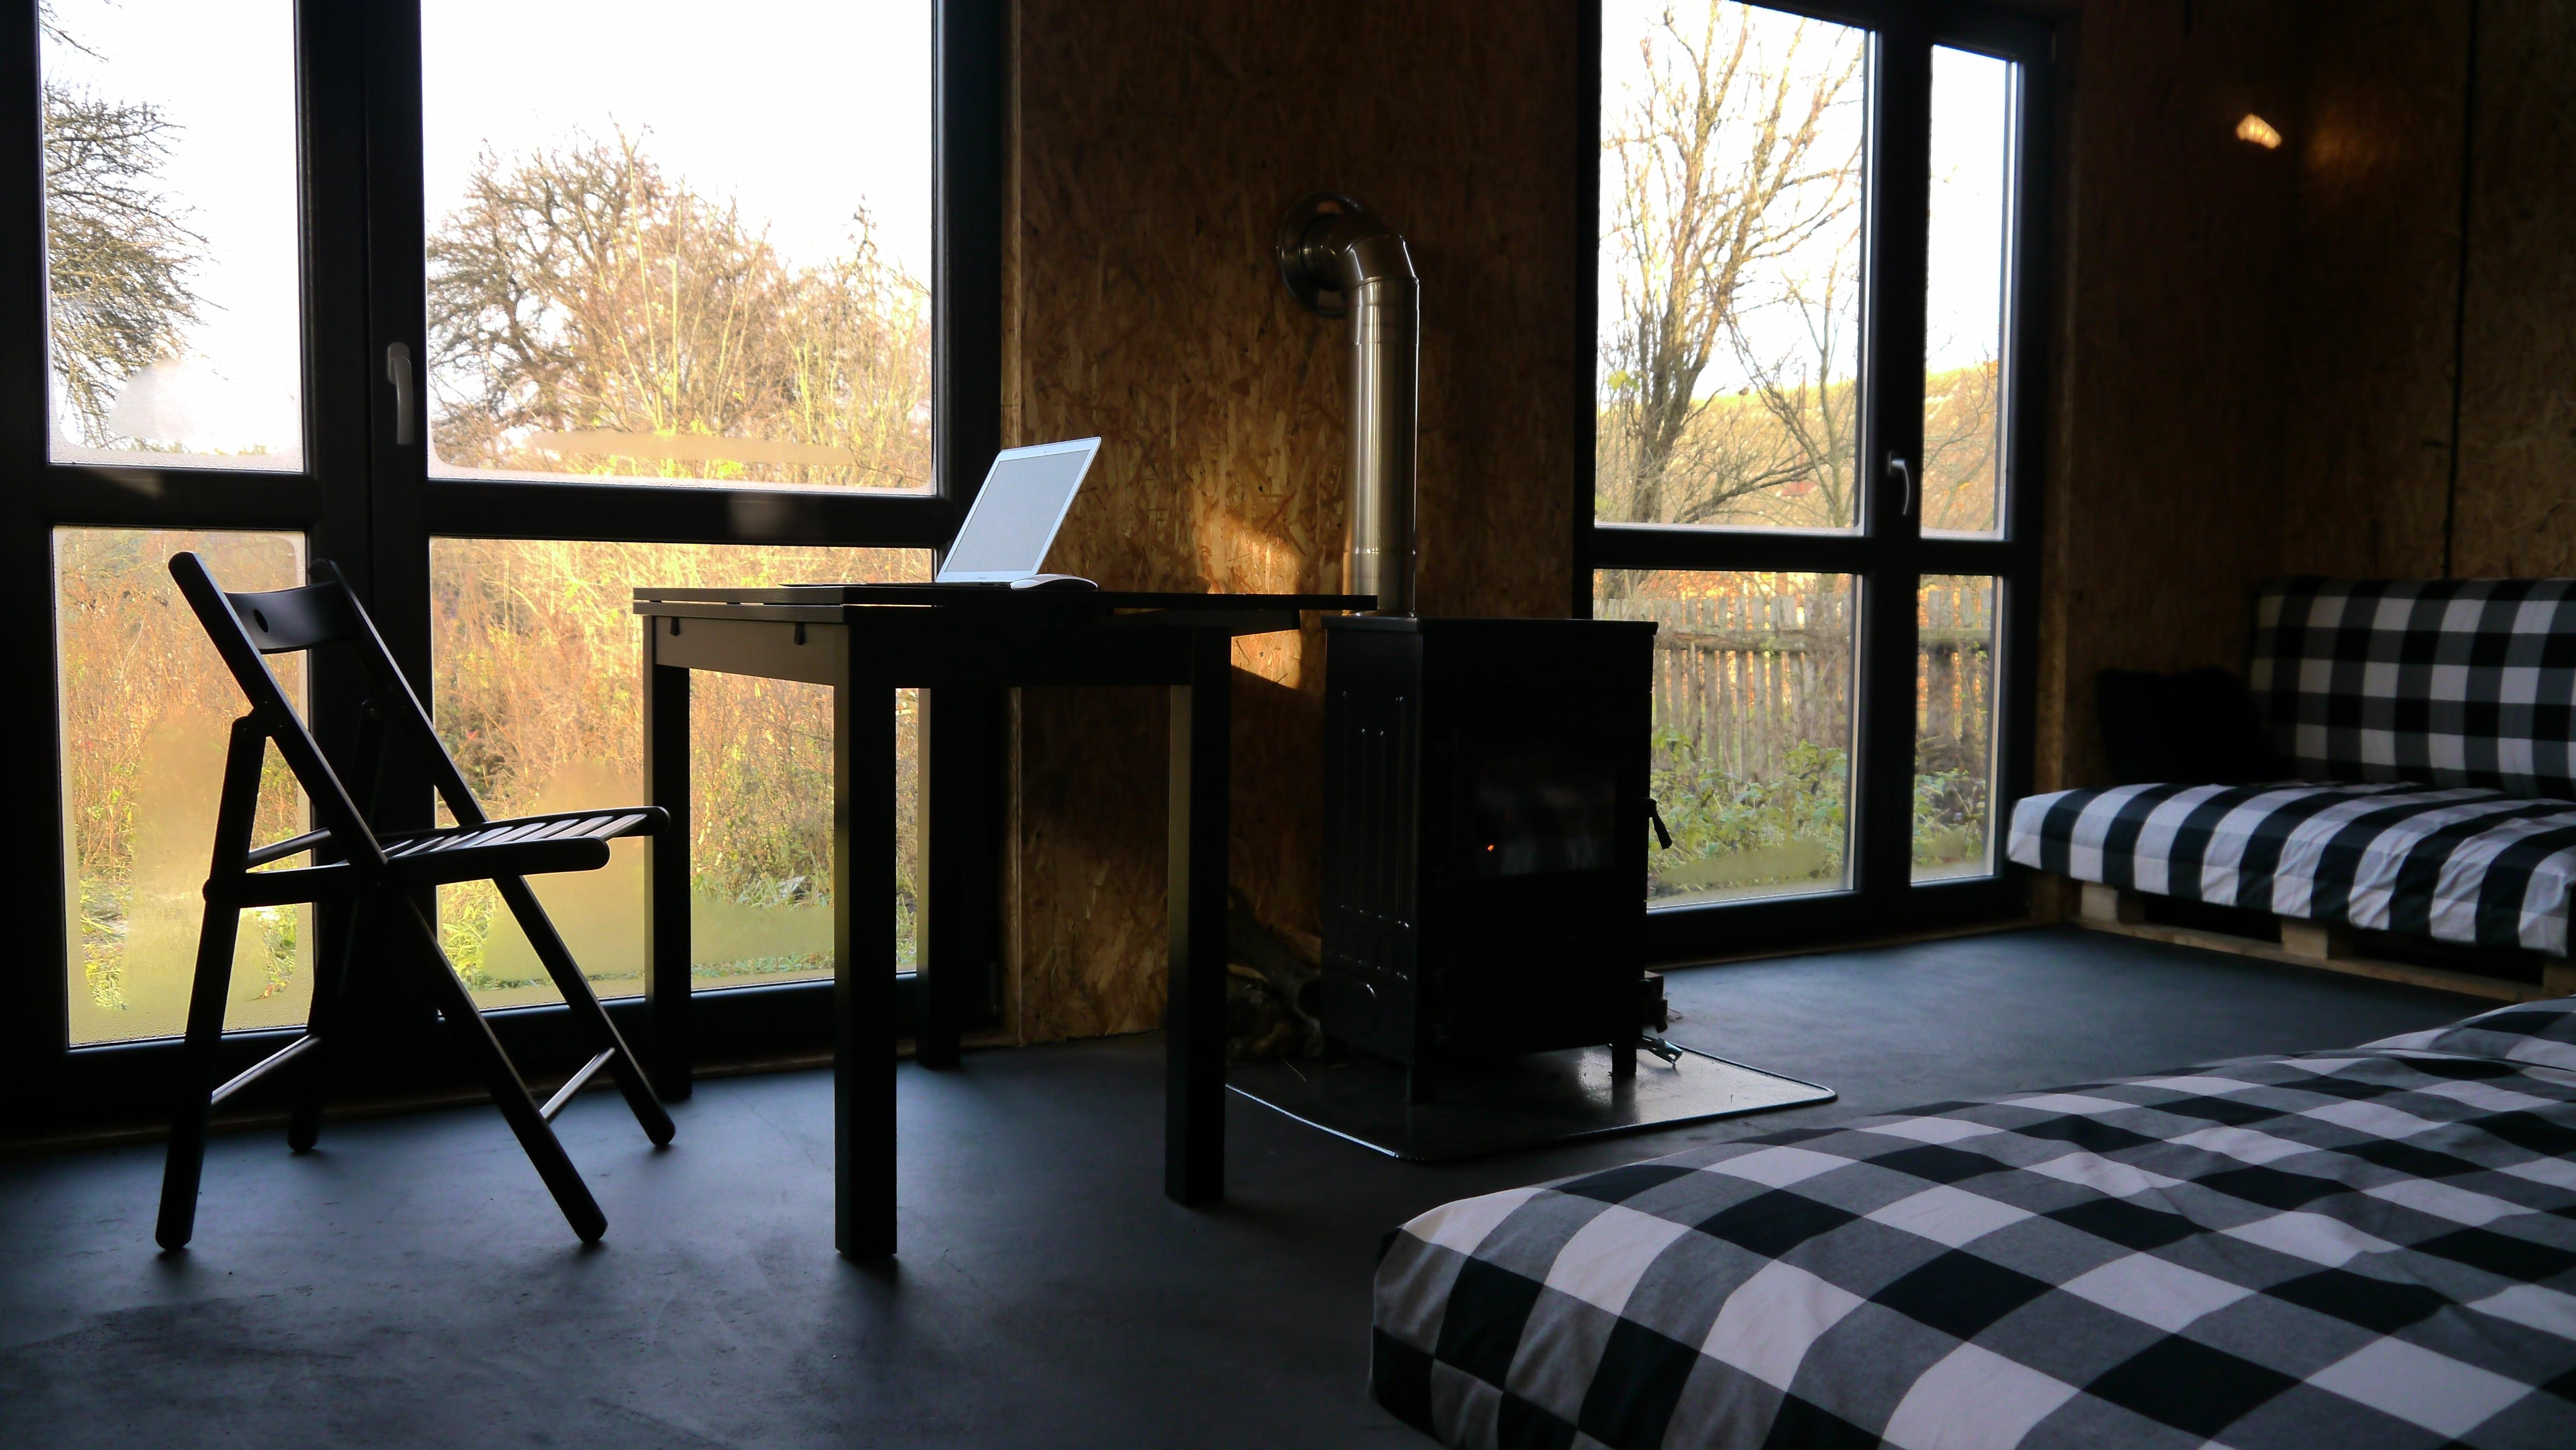 Siedlisko Otwartych Okiennic - Where will I sleep?